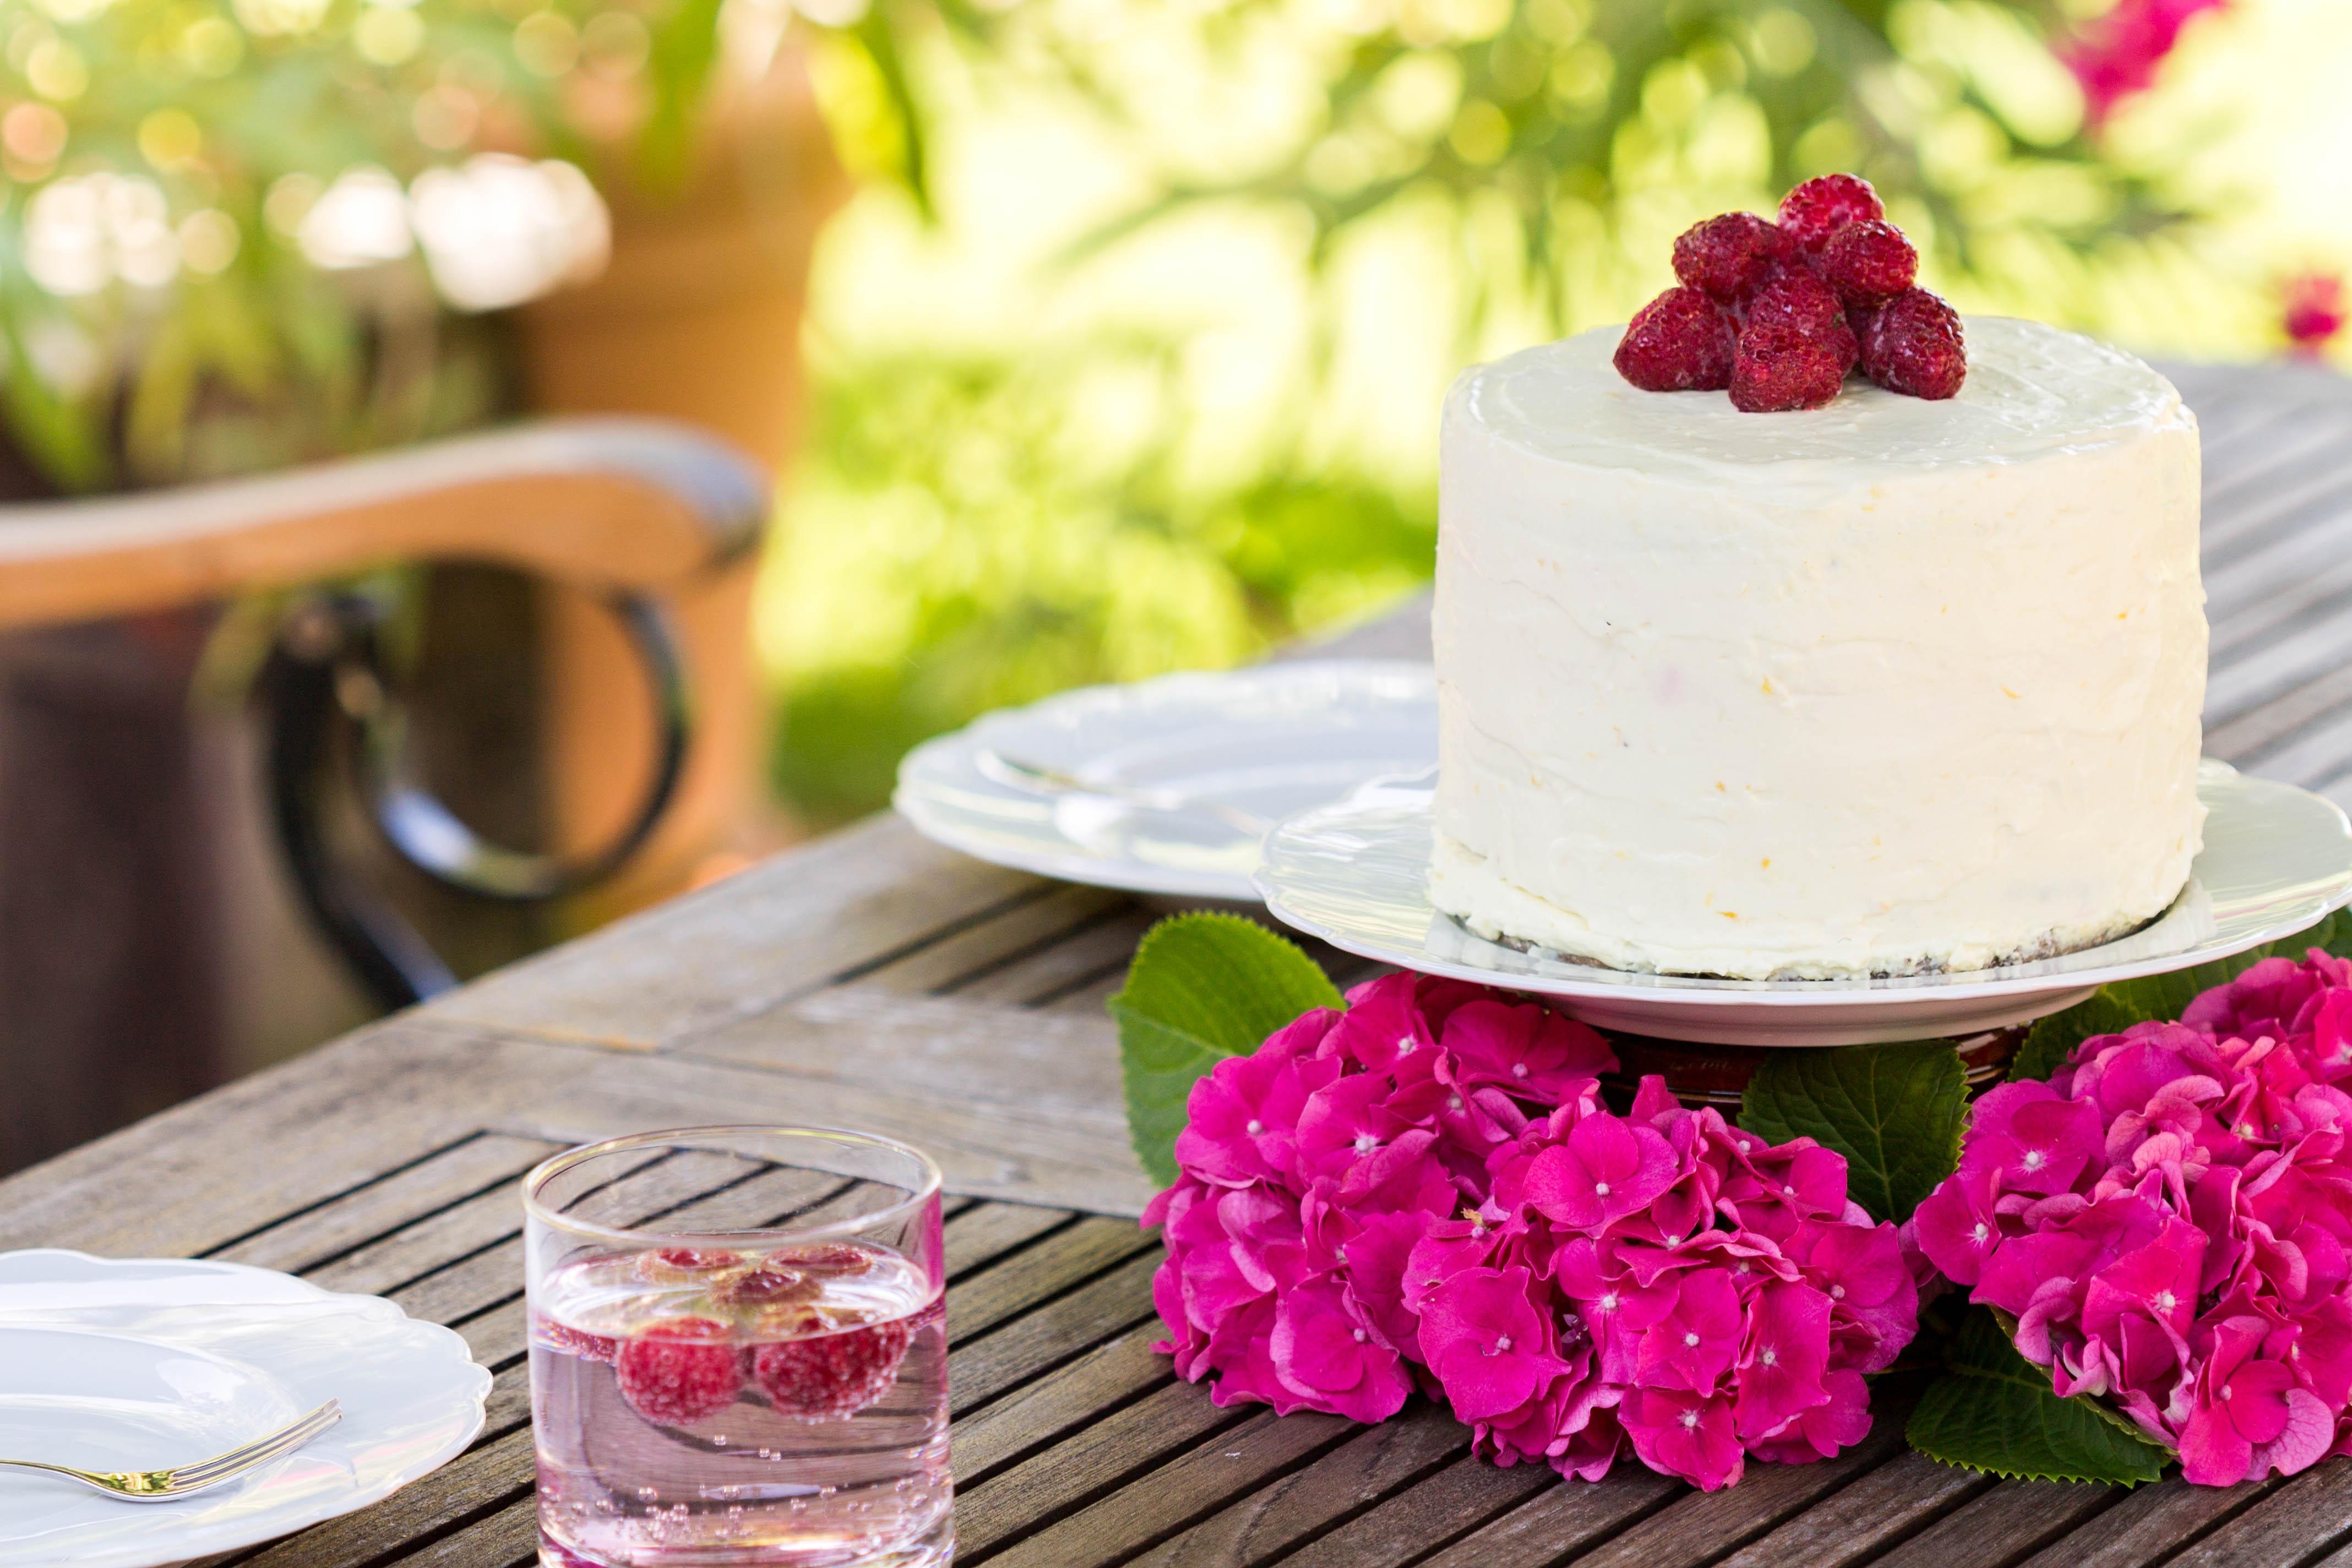 FAIBLE_Lemon-Poppyseed-Cake with Raspberries_lchf_6